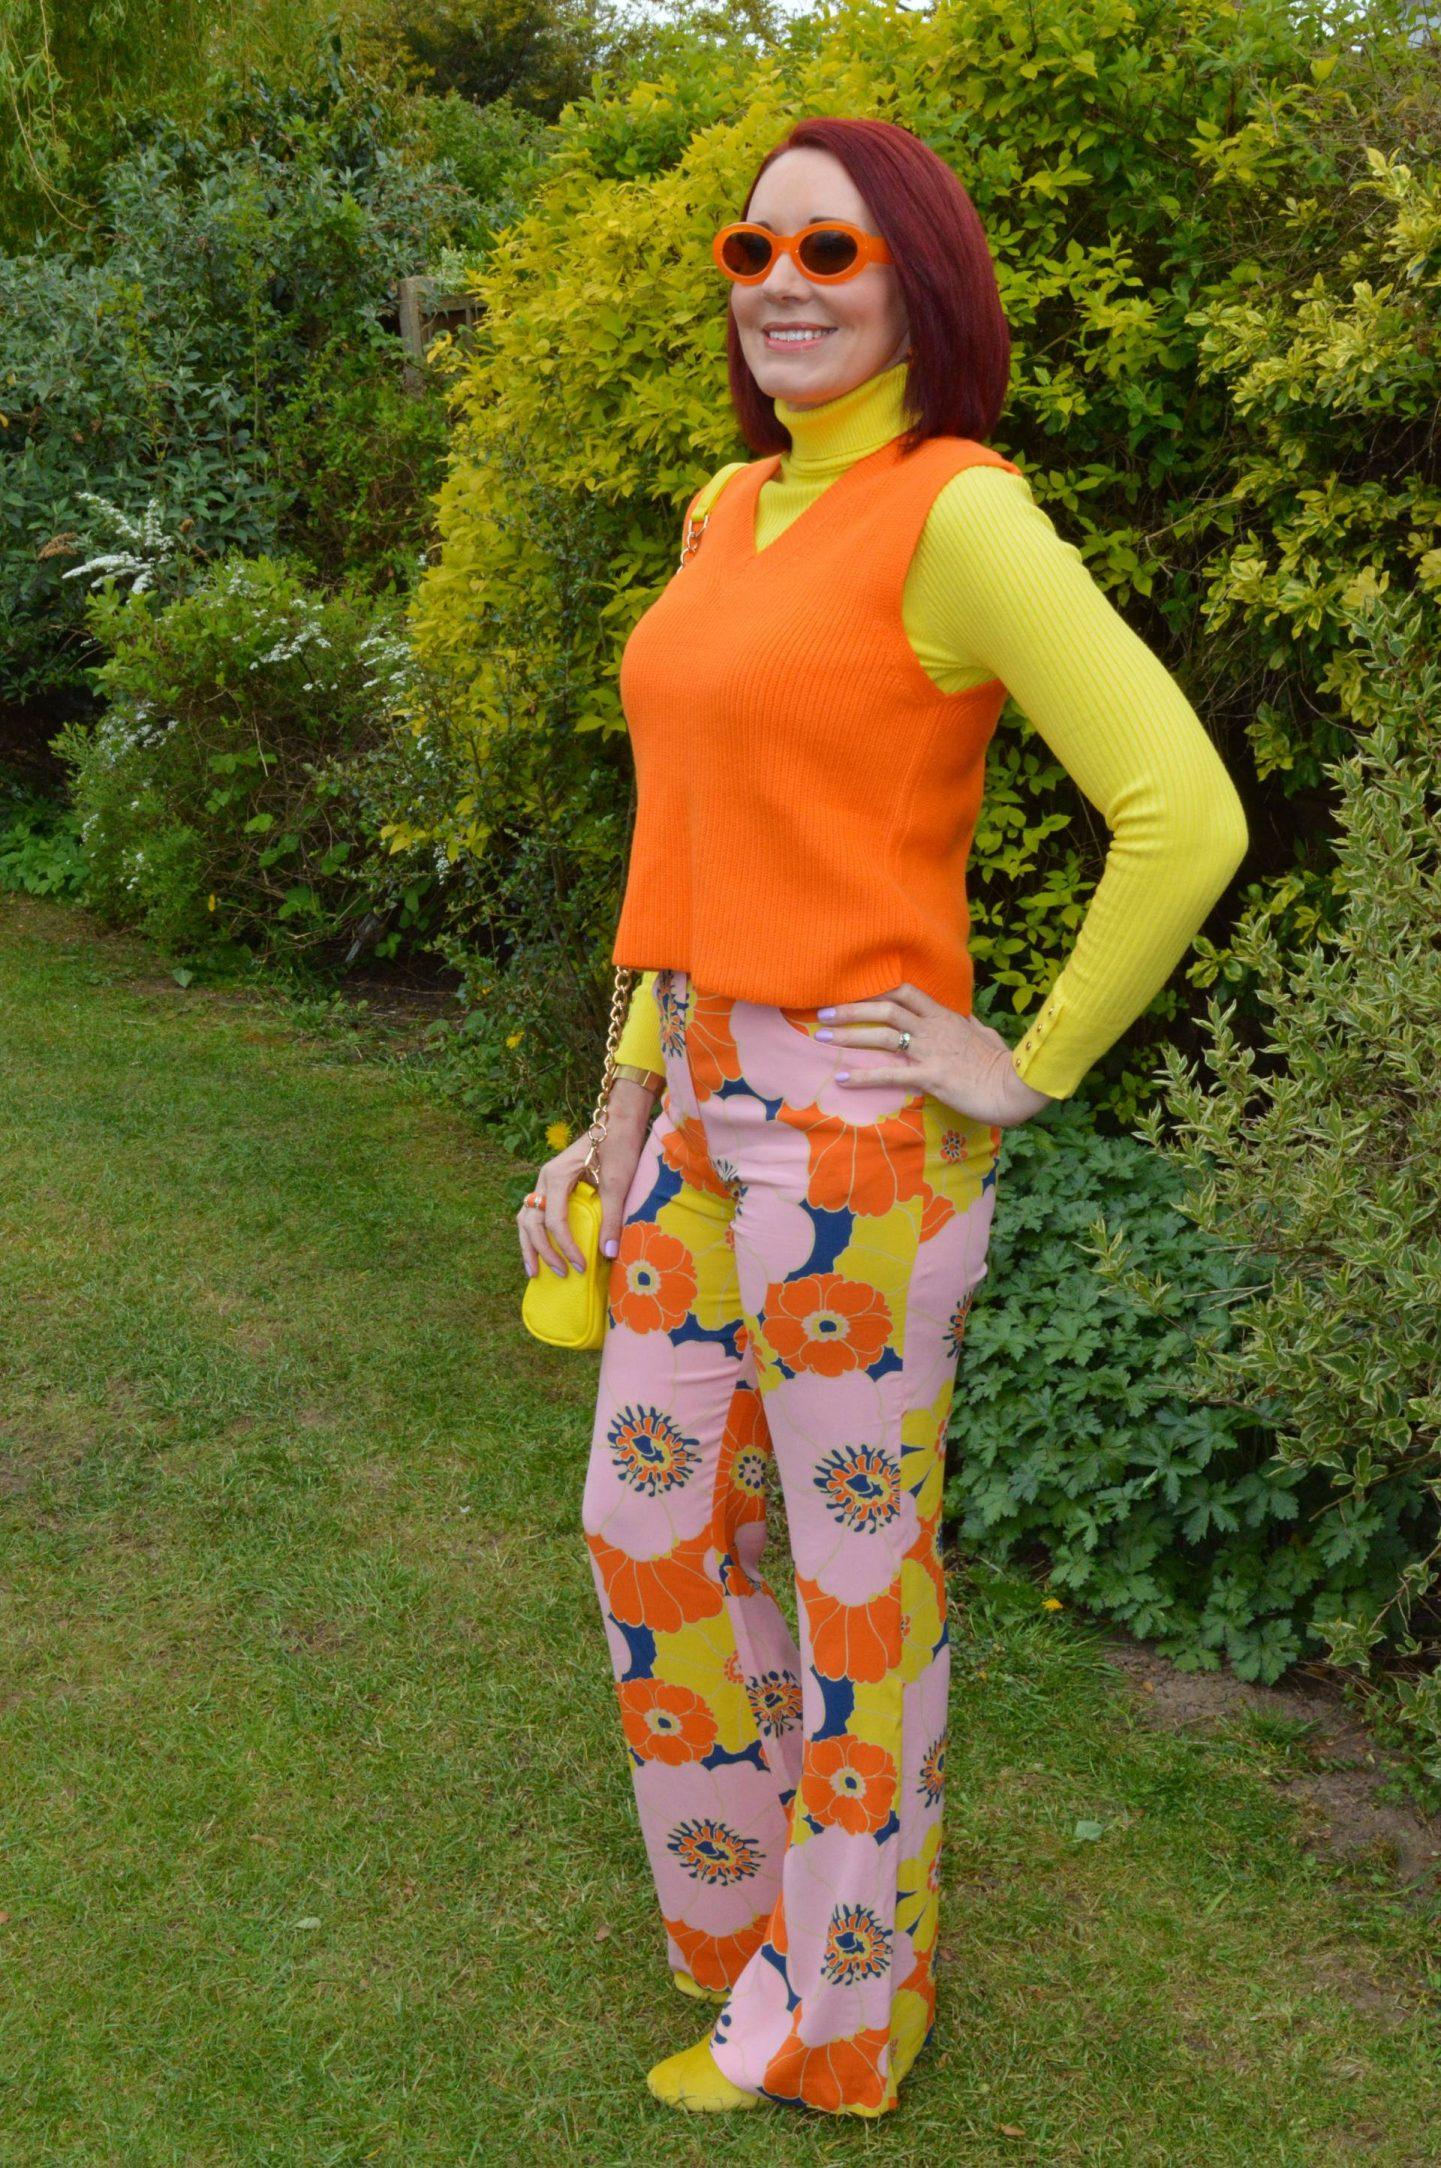 Zara pink flower print Trousers, Zara orange knitted vest, New Look yellow ribbed jumper, Zara orange frame sunglasses